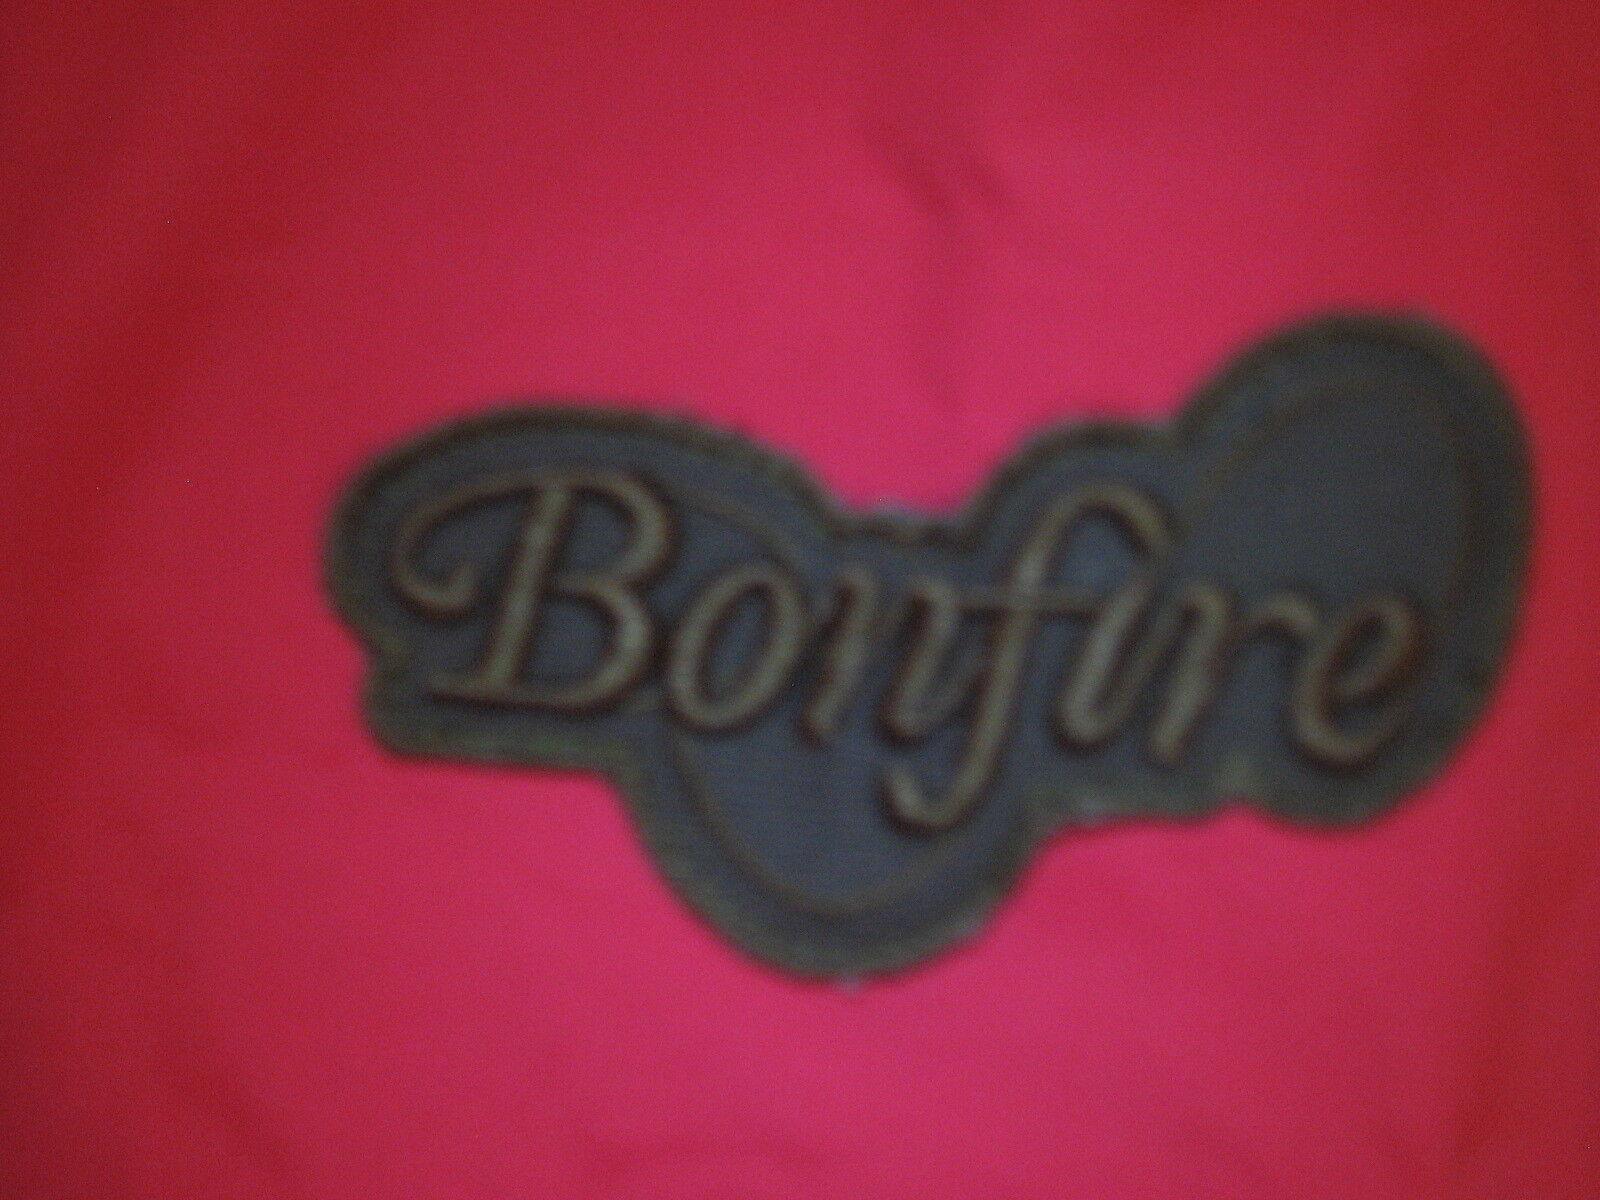 Bonfire Bonfire Bonfire Snowboarding Co. Ski Pants Particle Classic Fit Damenschuhe Large Hot Rosa cca4aa